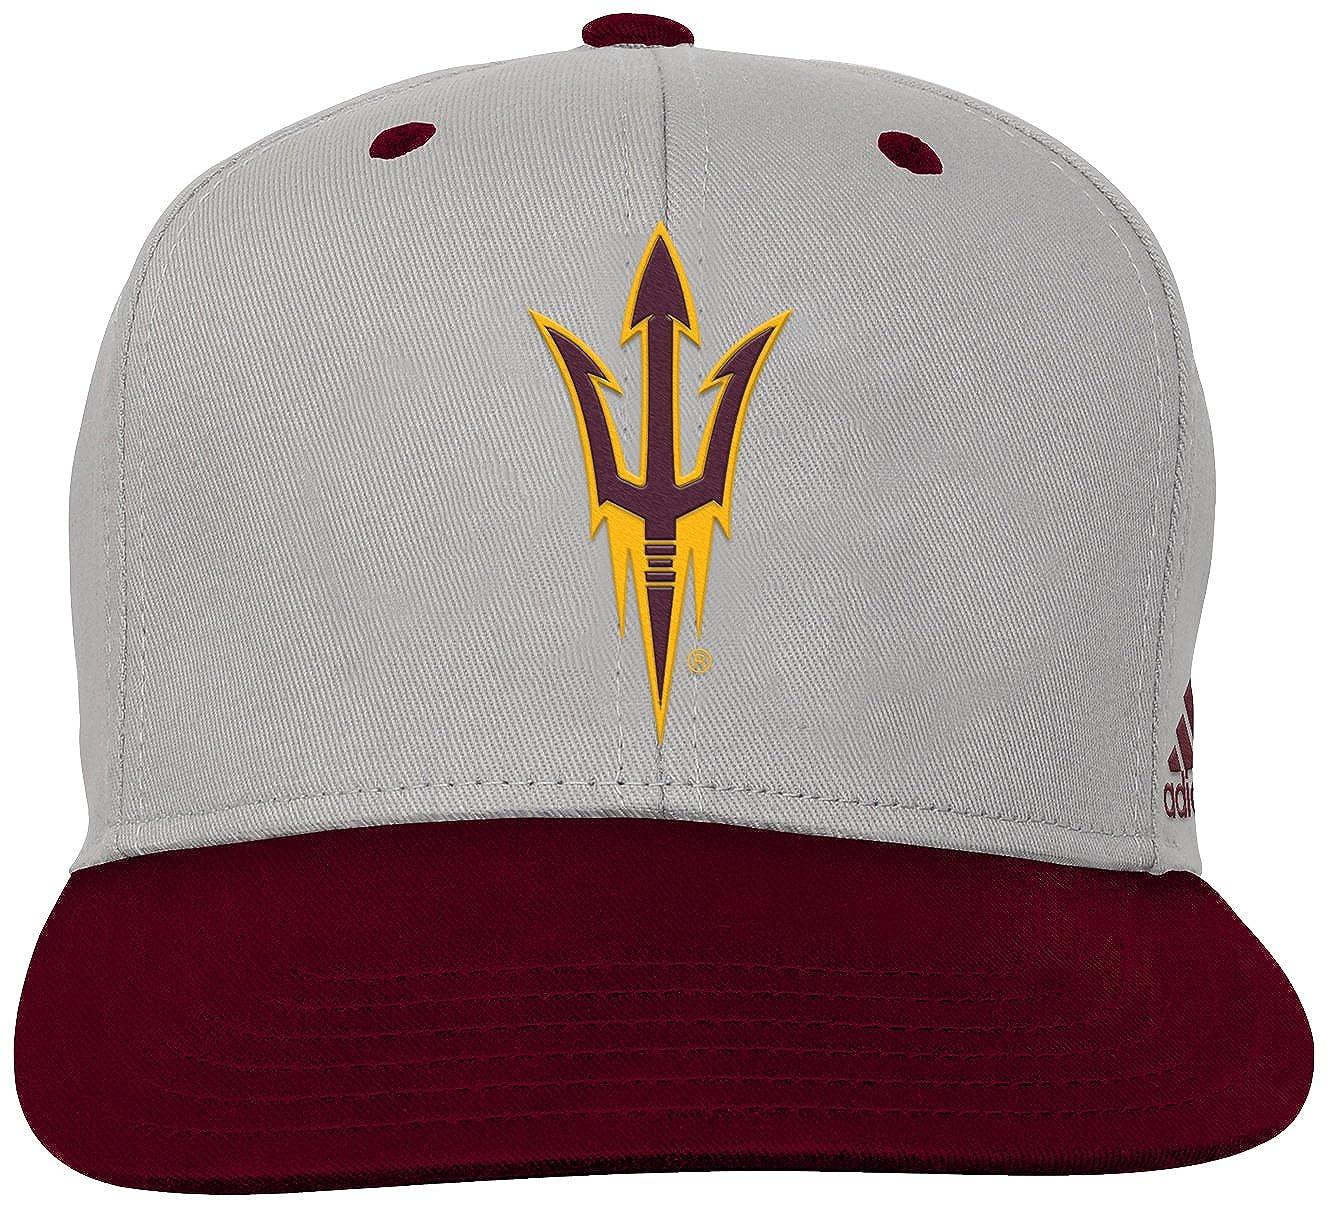 Classic Maroon NCAA Arizona State Sun Devils Youth Outerstuff Grey 2-Tone Flat Brim Snapback Hat Youth One Size